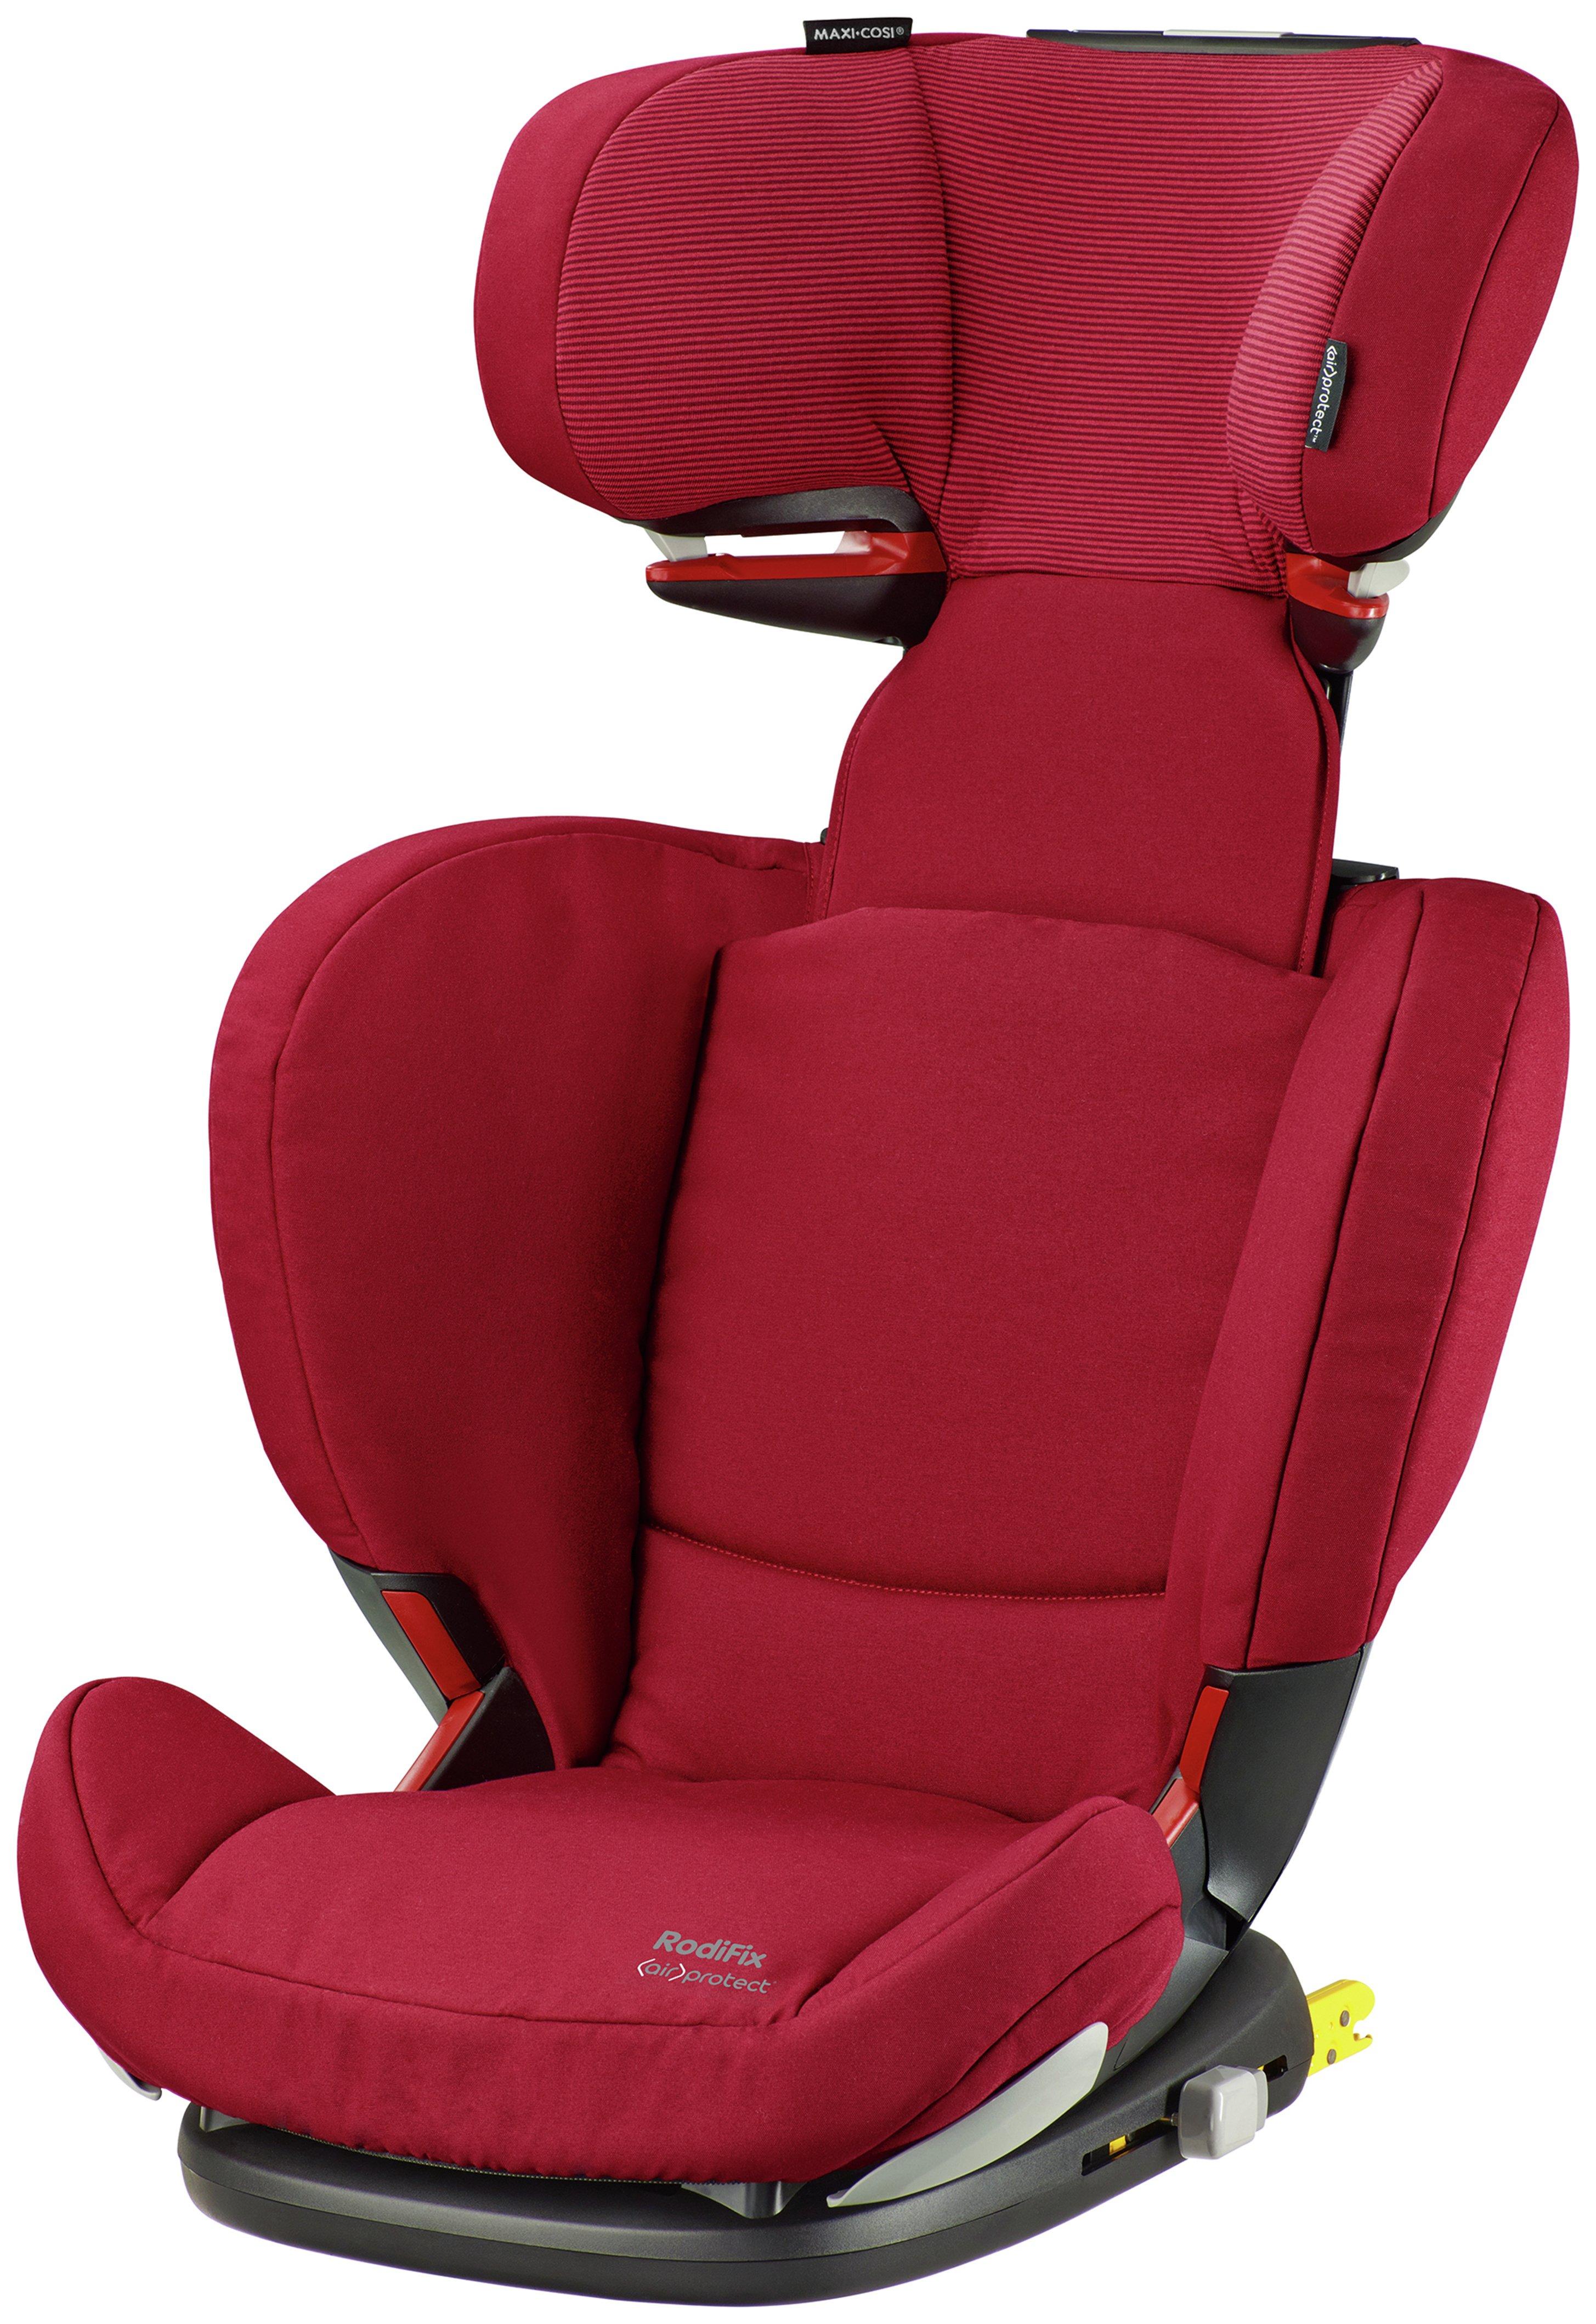 maxi-cosi-rodifix-group-2-3-robin-red-car-seat